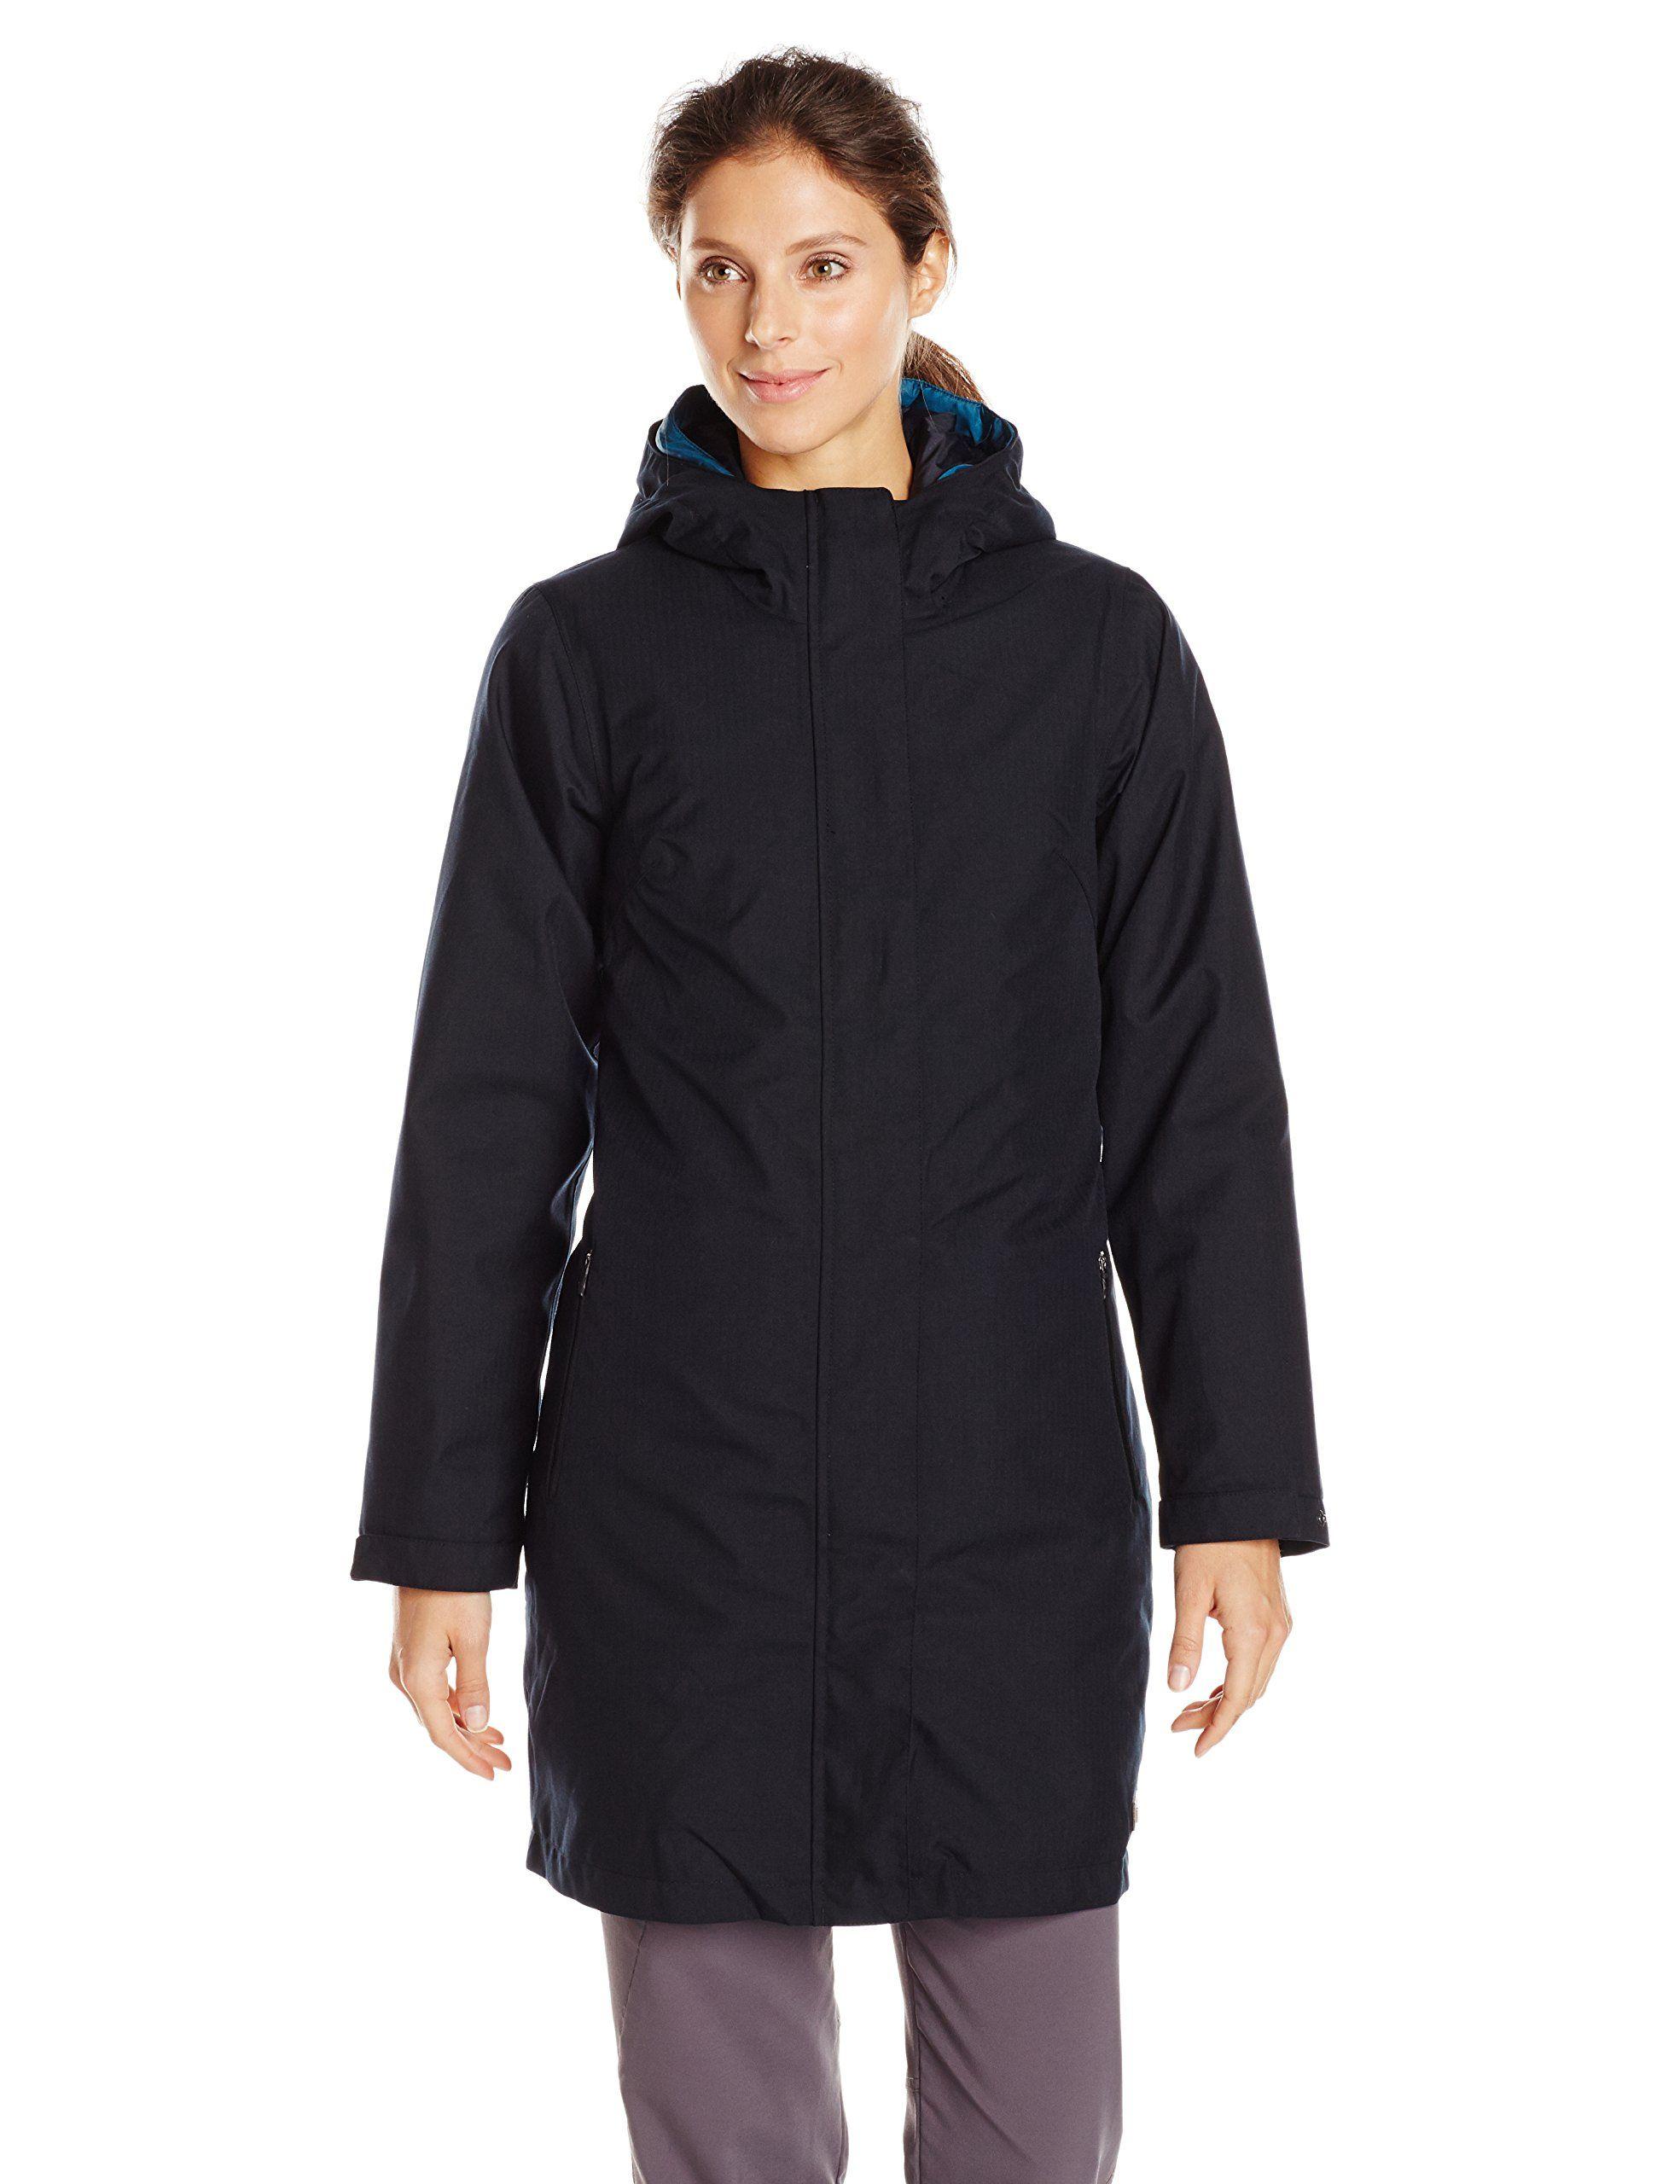 a912a961ea Merrell Women's Novaya 3-in-1 Coat, Medium, Black. Three-in-one ...